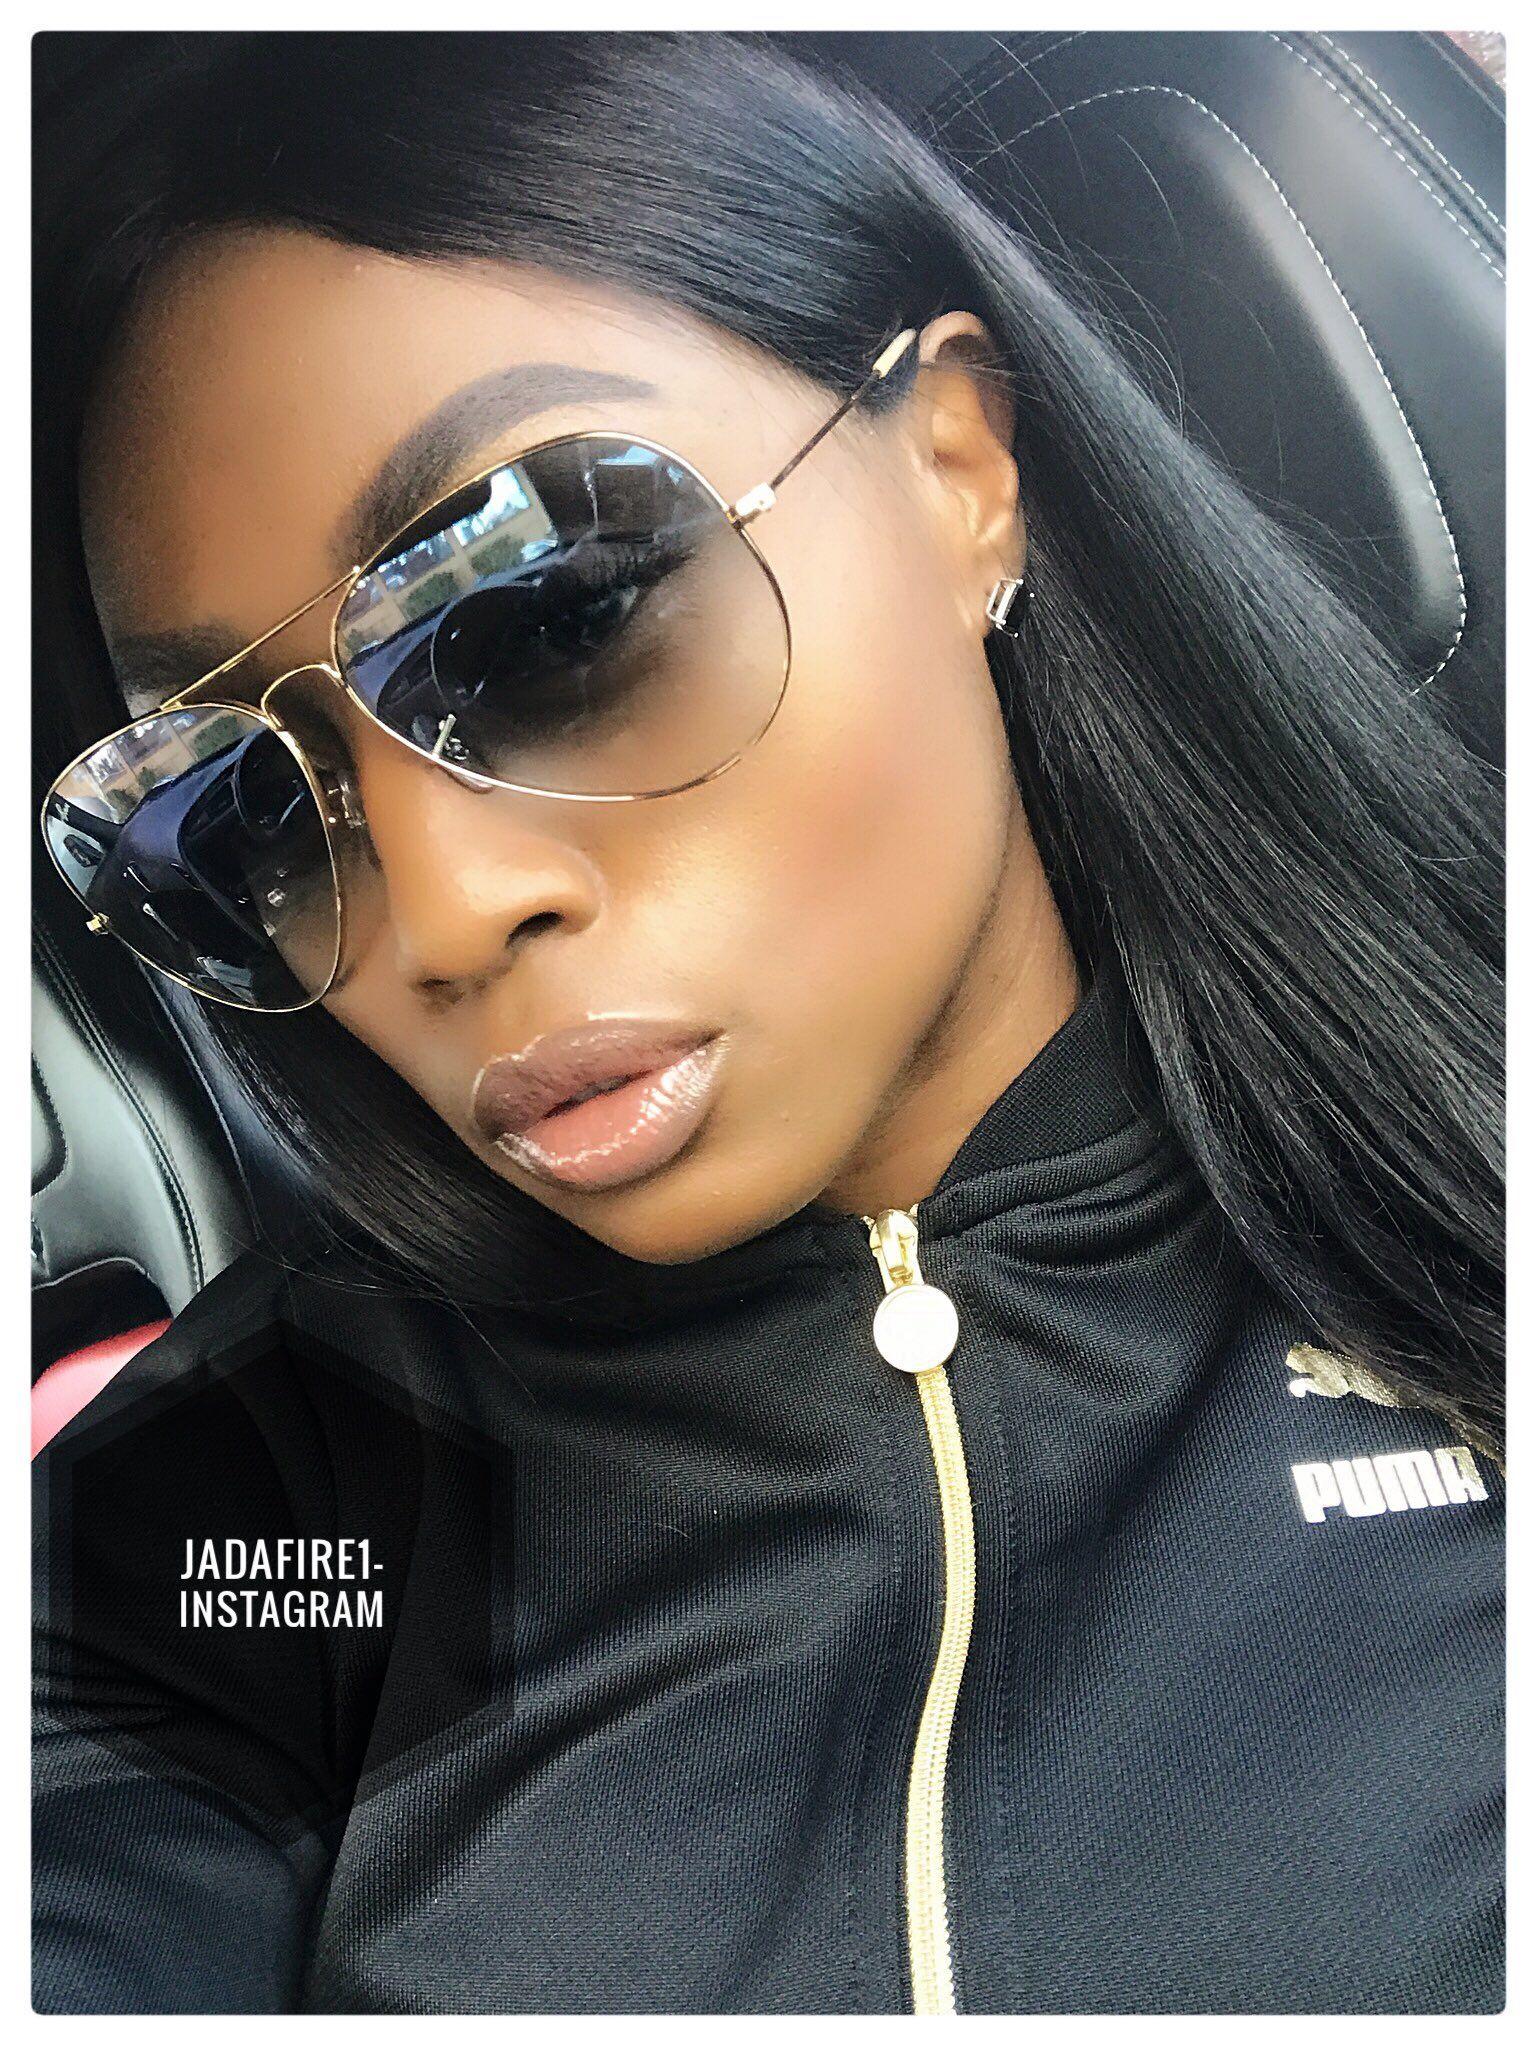 Ms Jada Fire Instagram Official